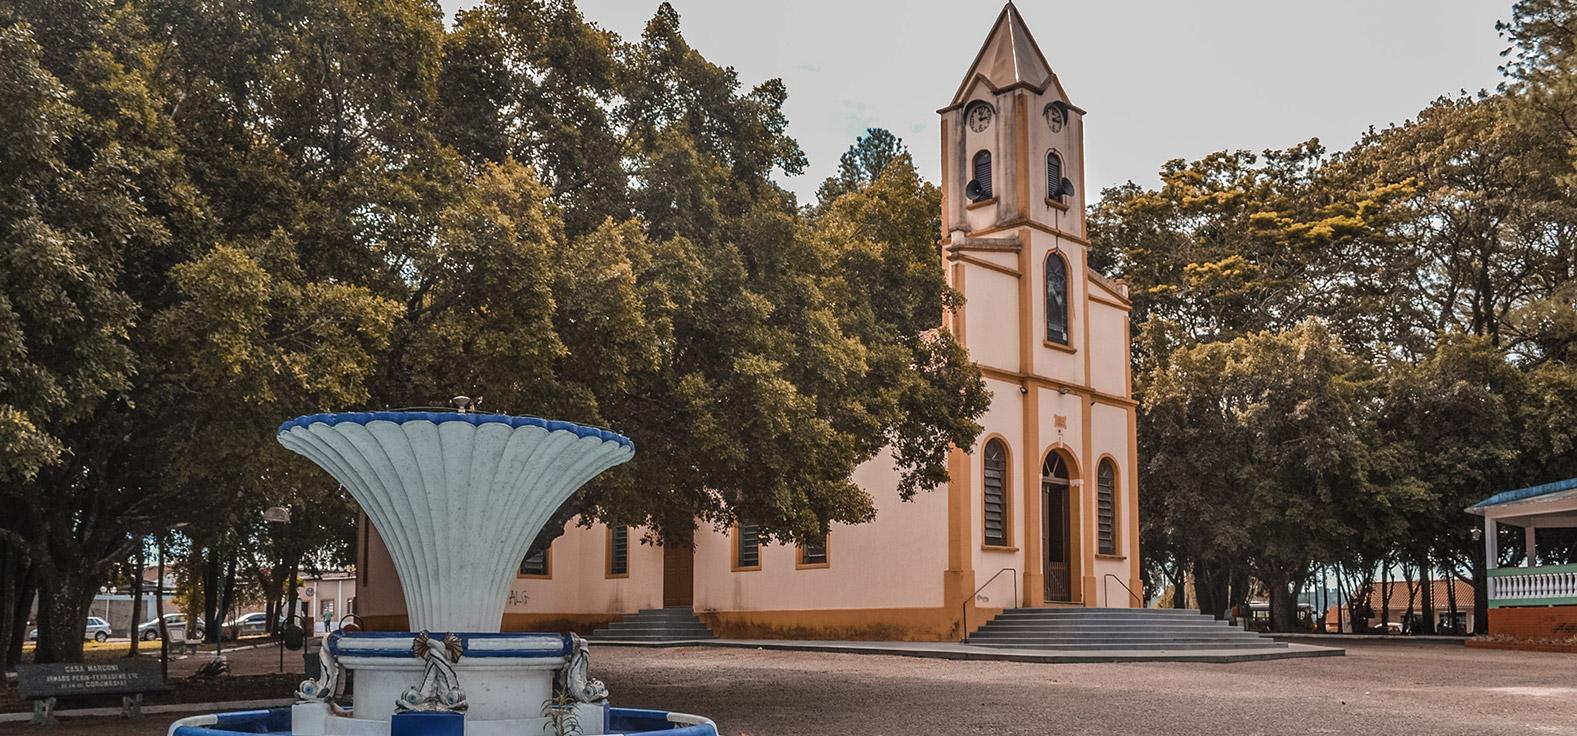 Praça de Corumbataí | Portal Serra do Itaquerí